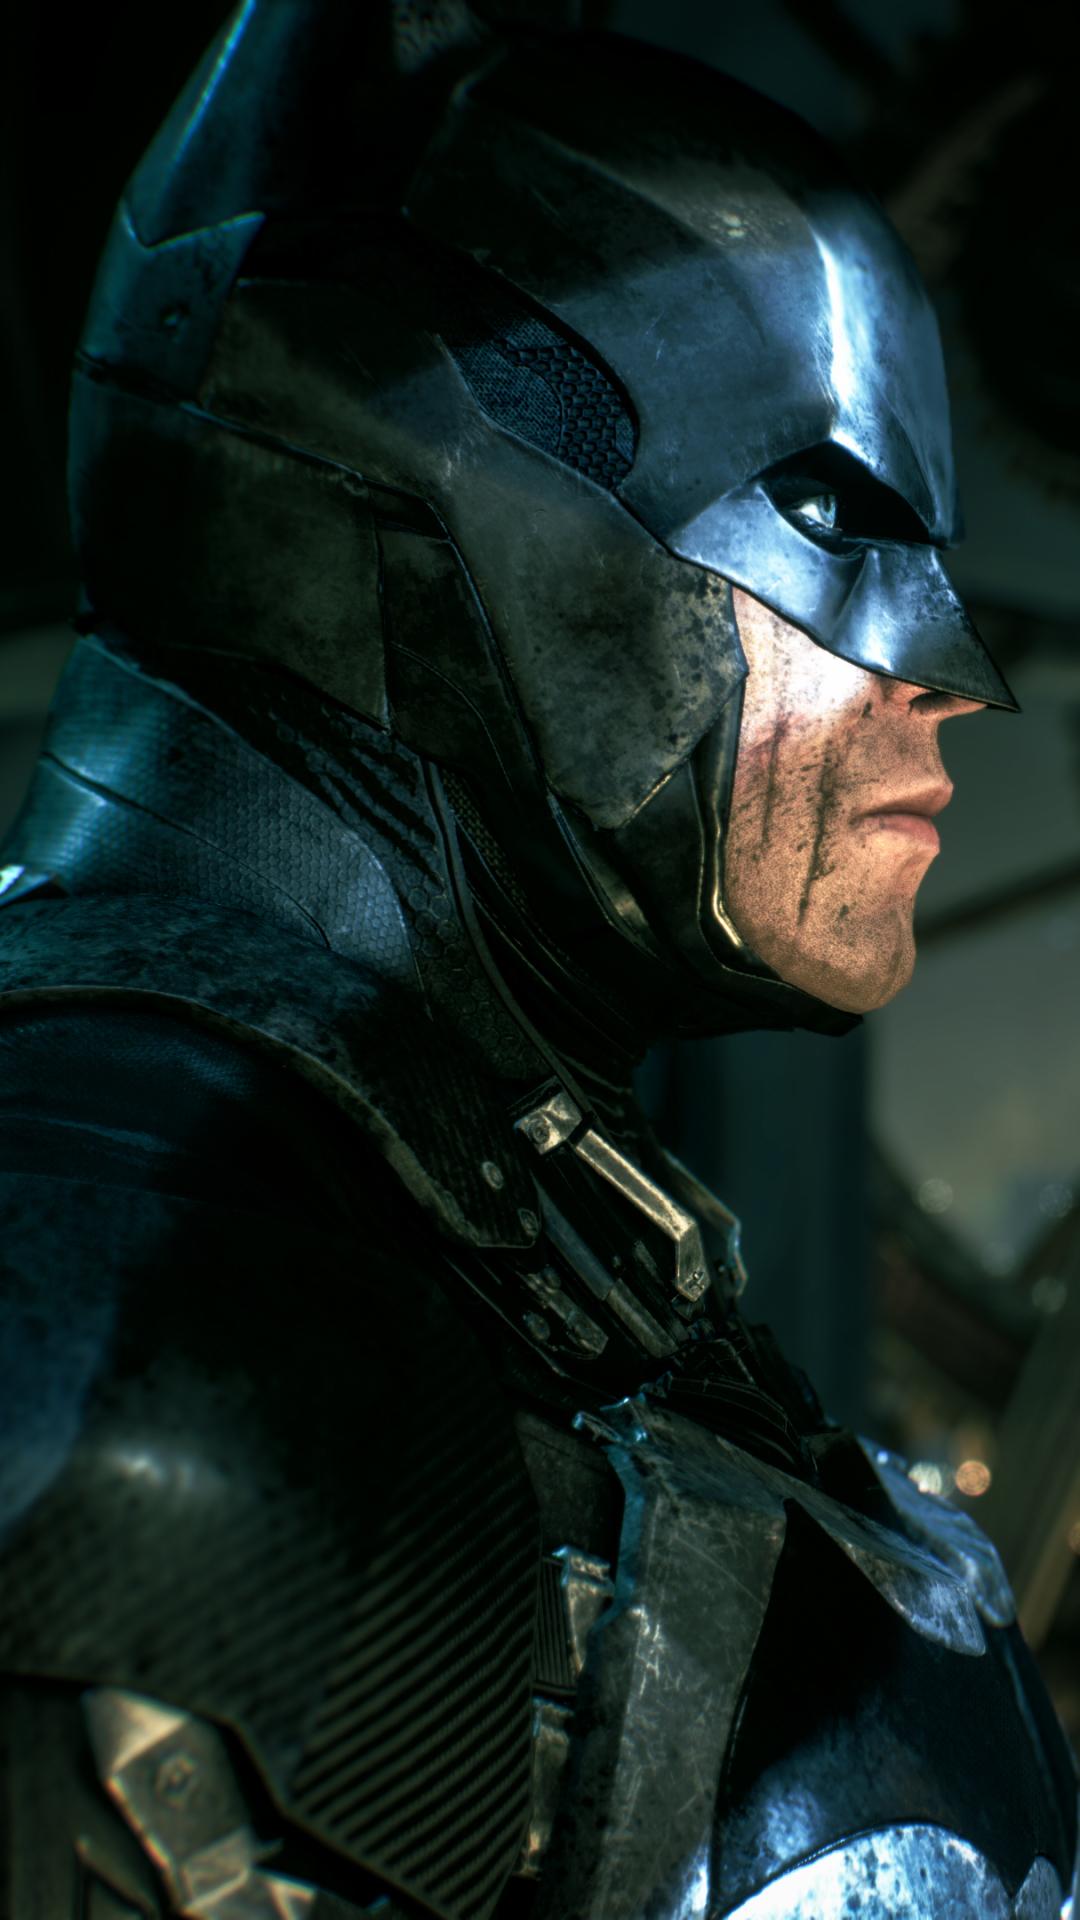 46 Batman Arkham Knight Apple Iphone 6 750x1334 Wallpapers